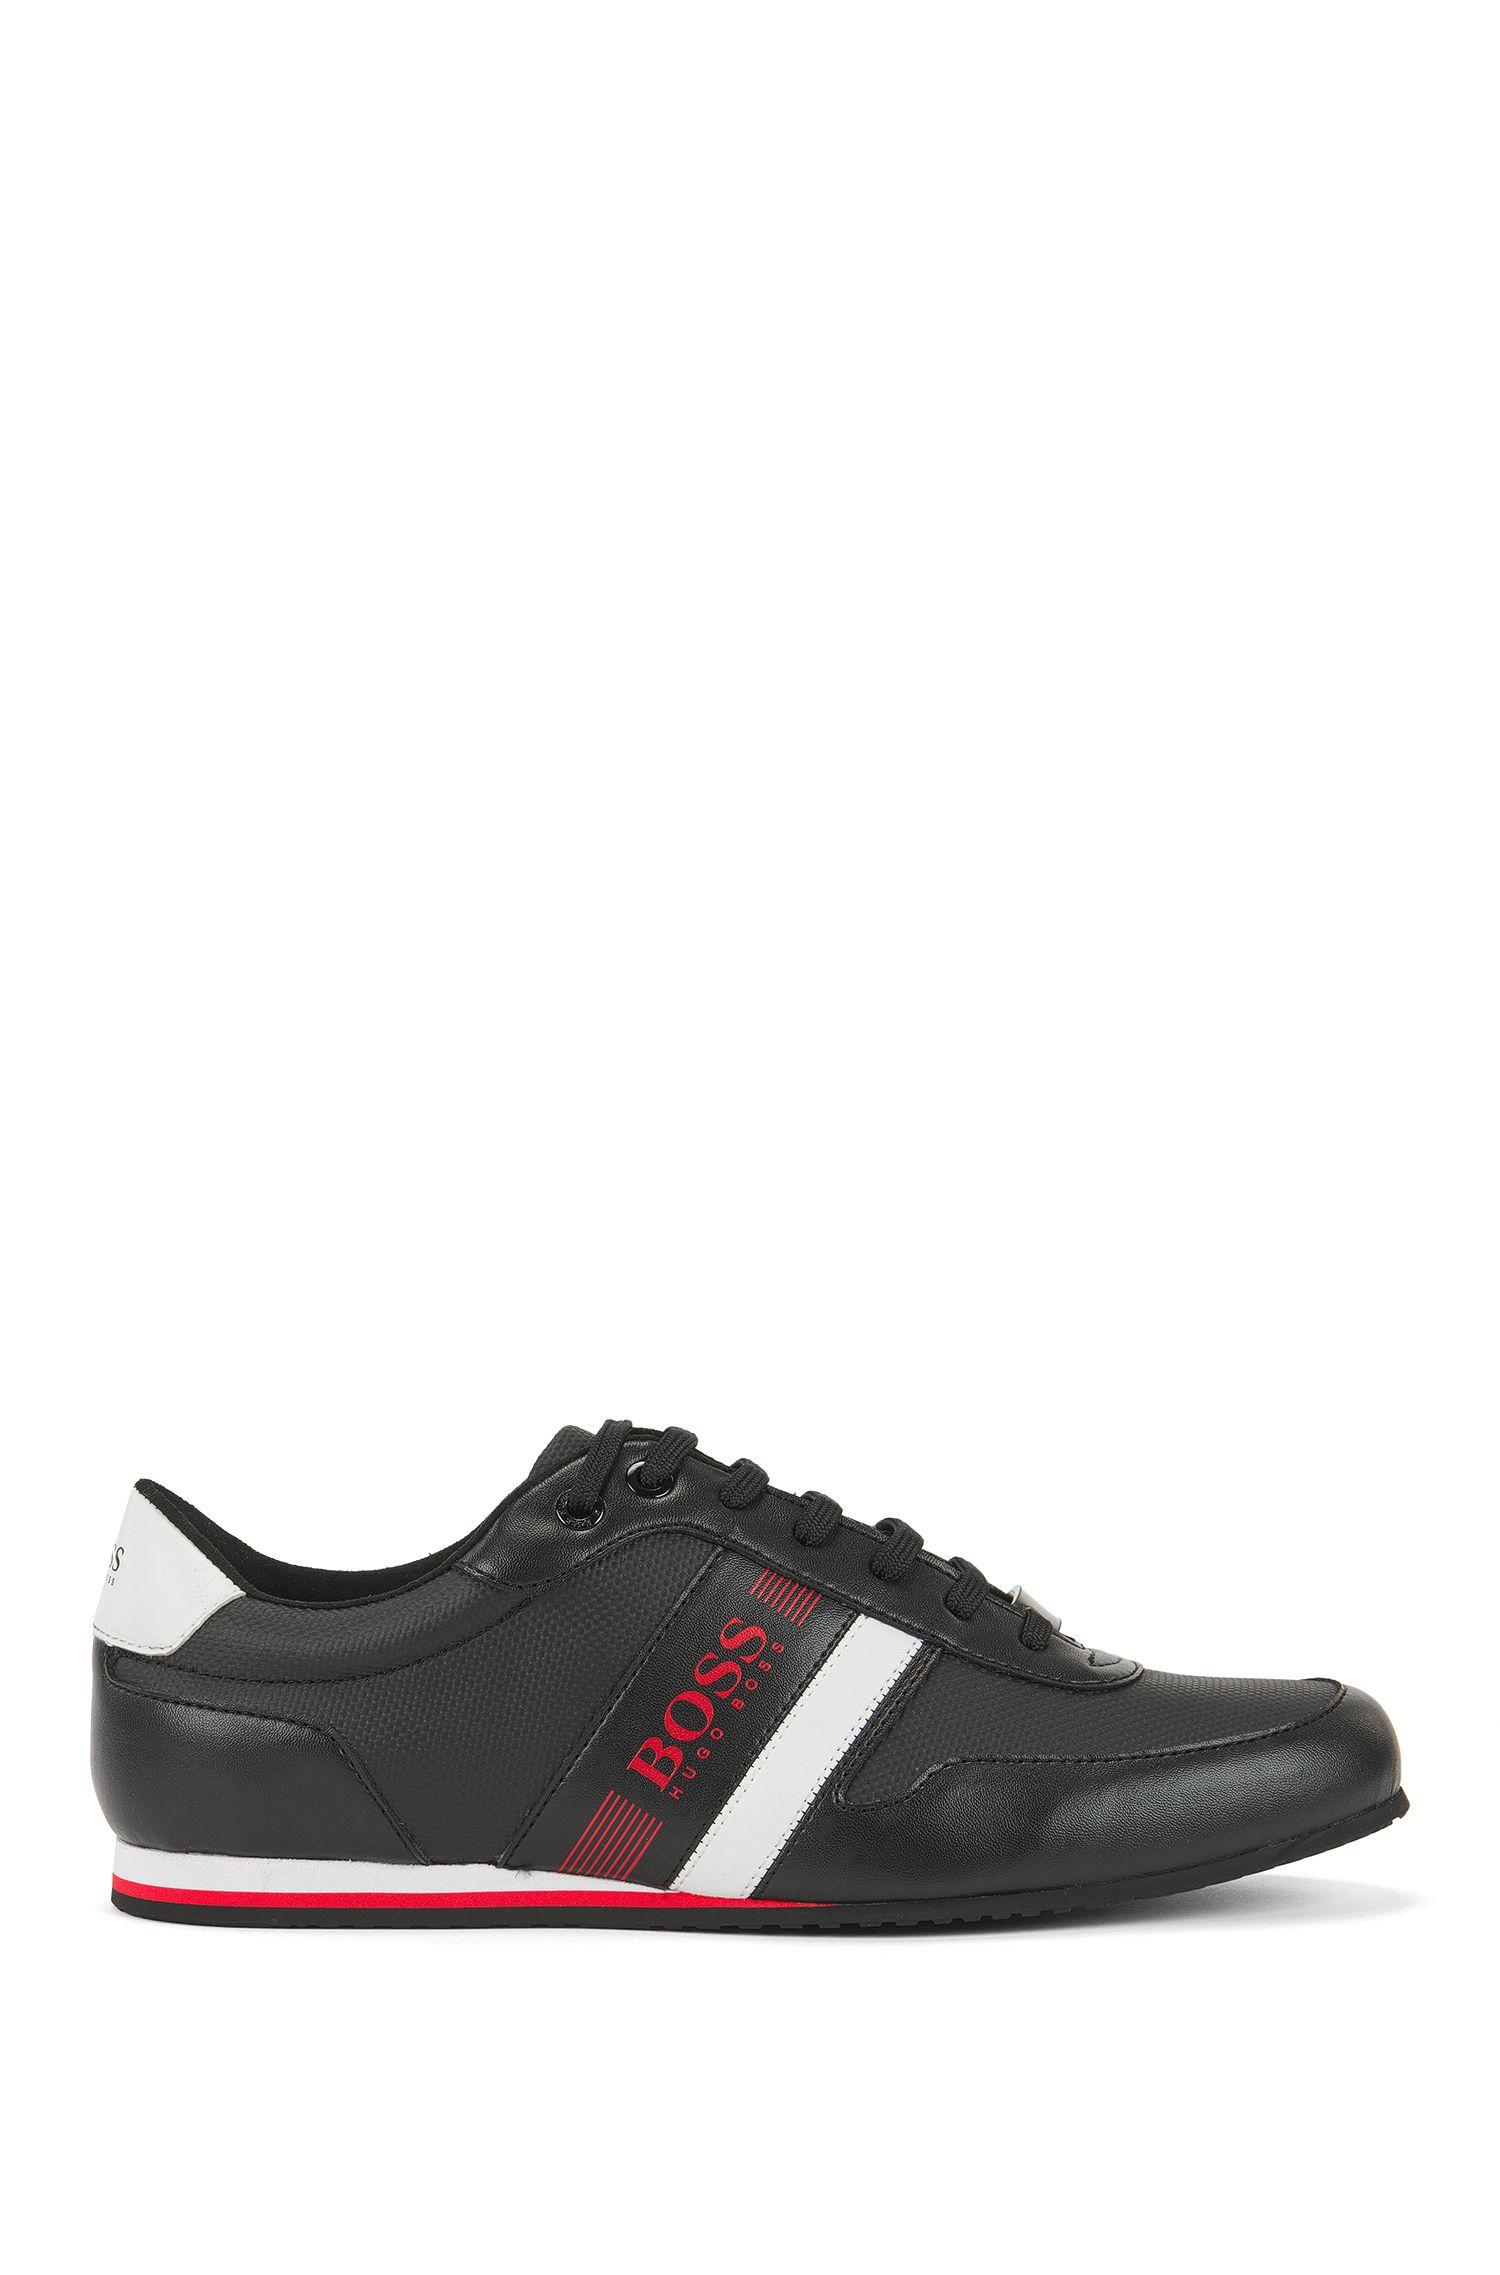 Sneakers low-top ultraleggere in tela rivestita